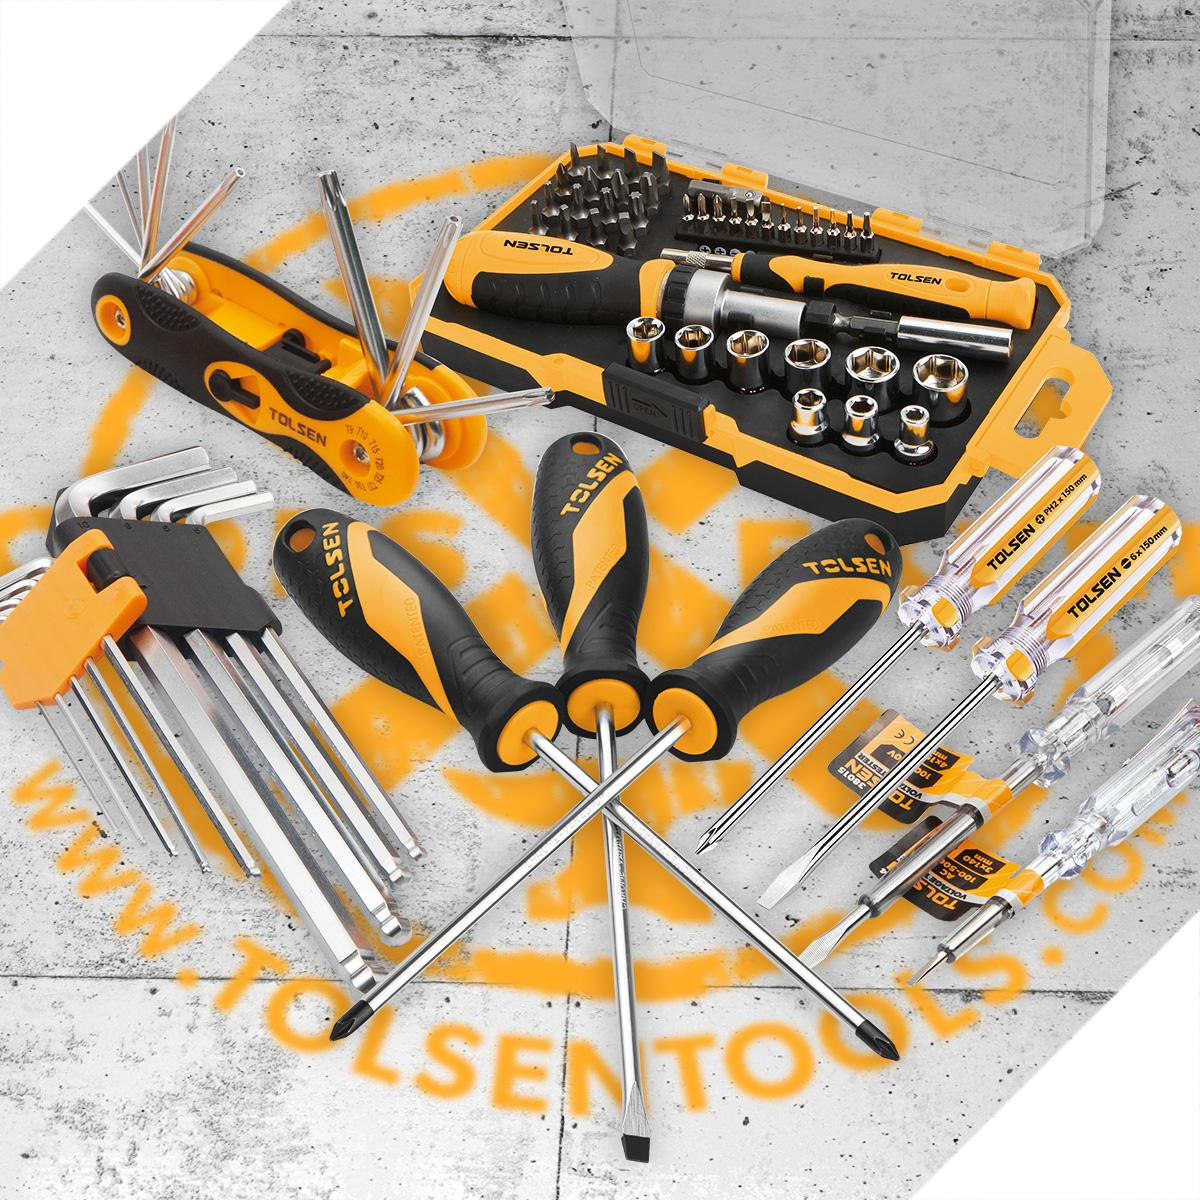 Fastening Tools